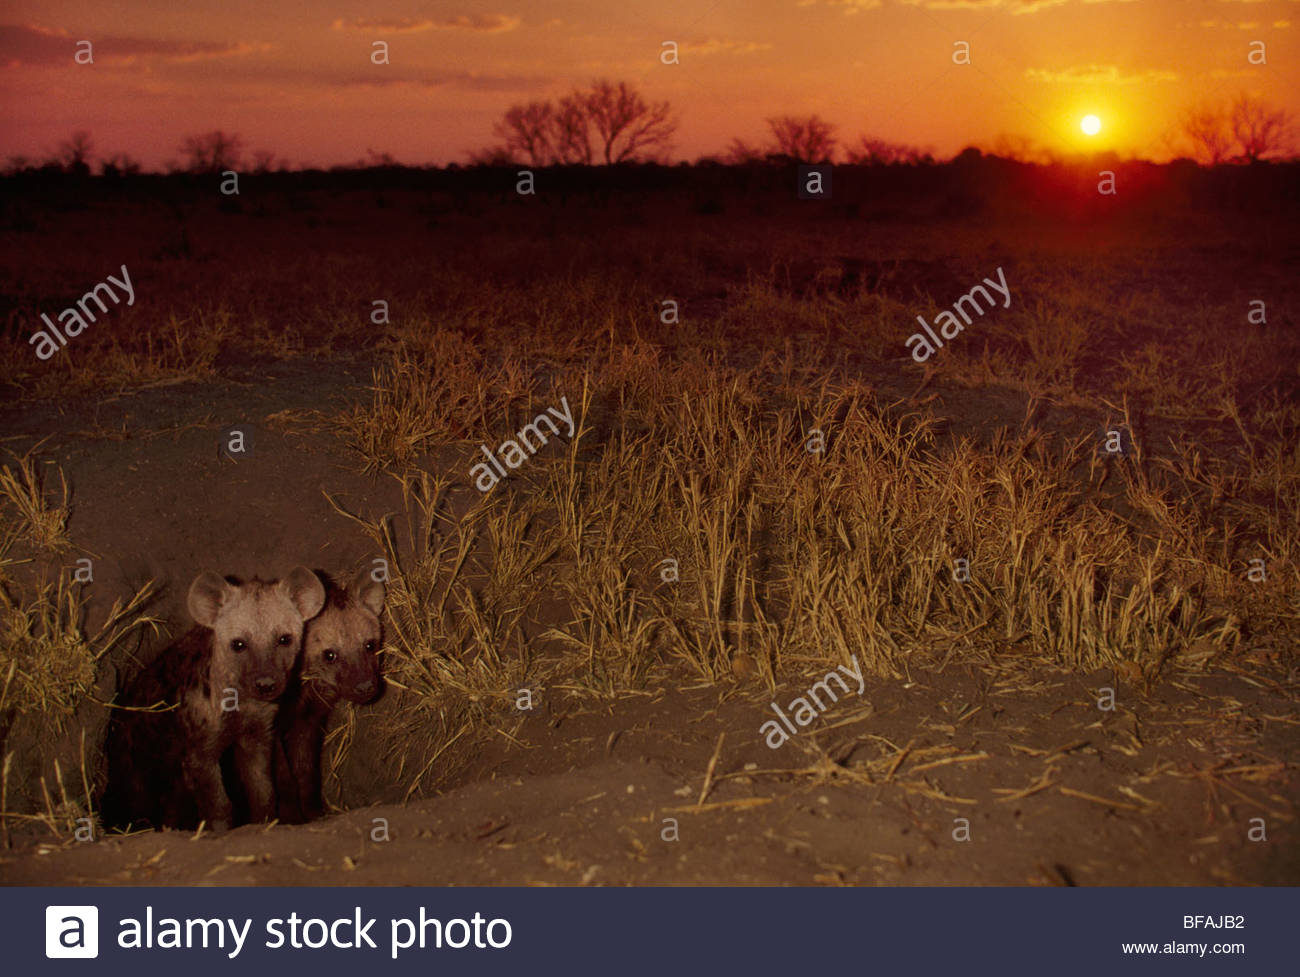 Spotted hyena pups at burrow, Crocuta crocuta, Okavango Delta, Botswana - Stock Image